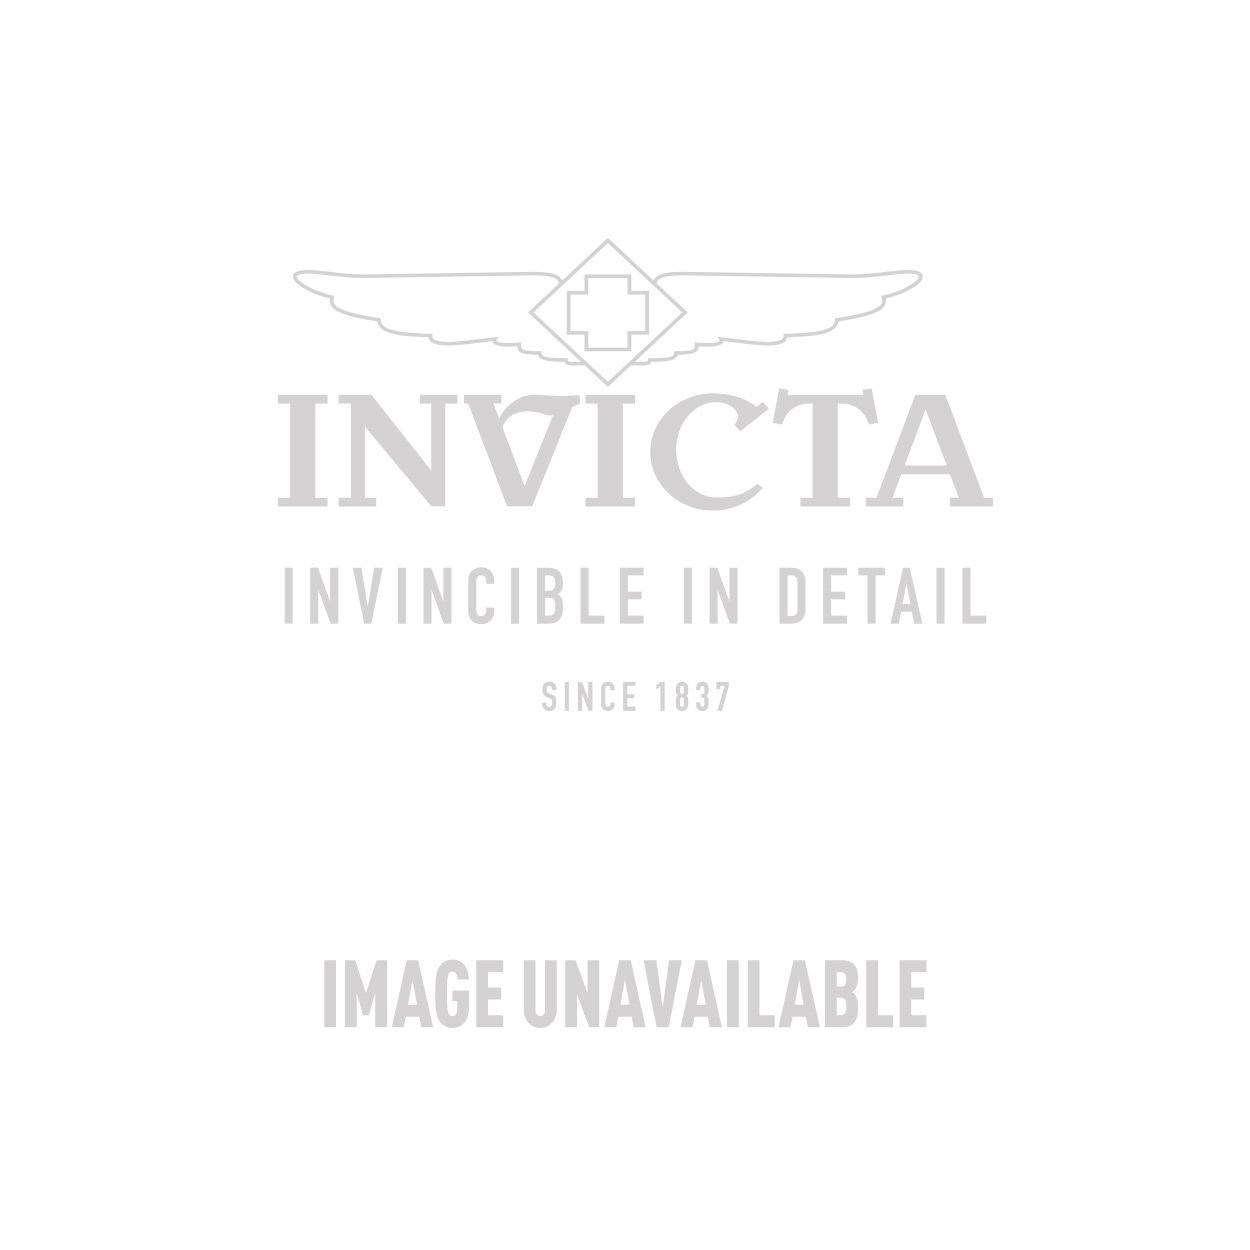 Invicta Corduba Swiss Movement Quartz Watch - Black case with Black, Blue tone Stainless Steel, Polyurethane band - Model 10509